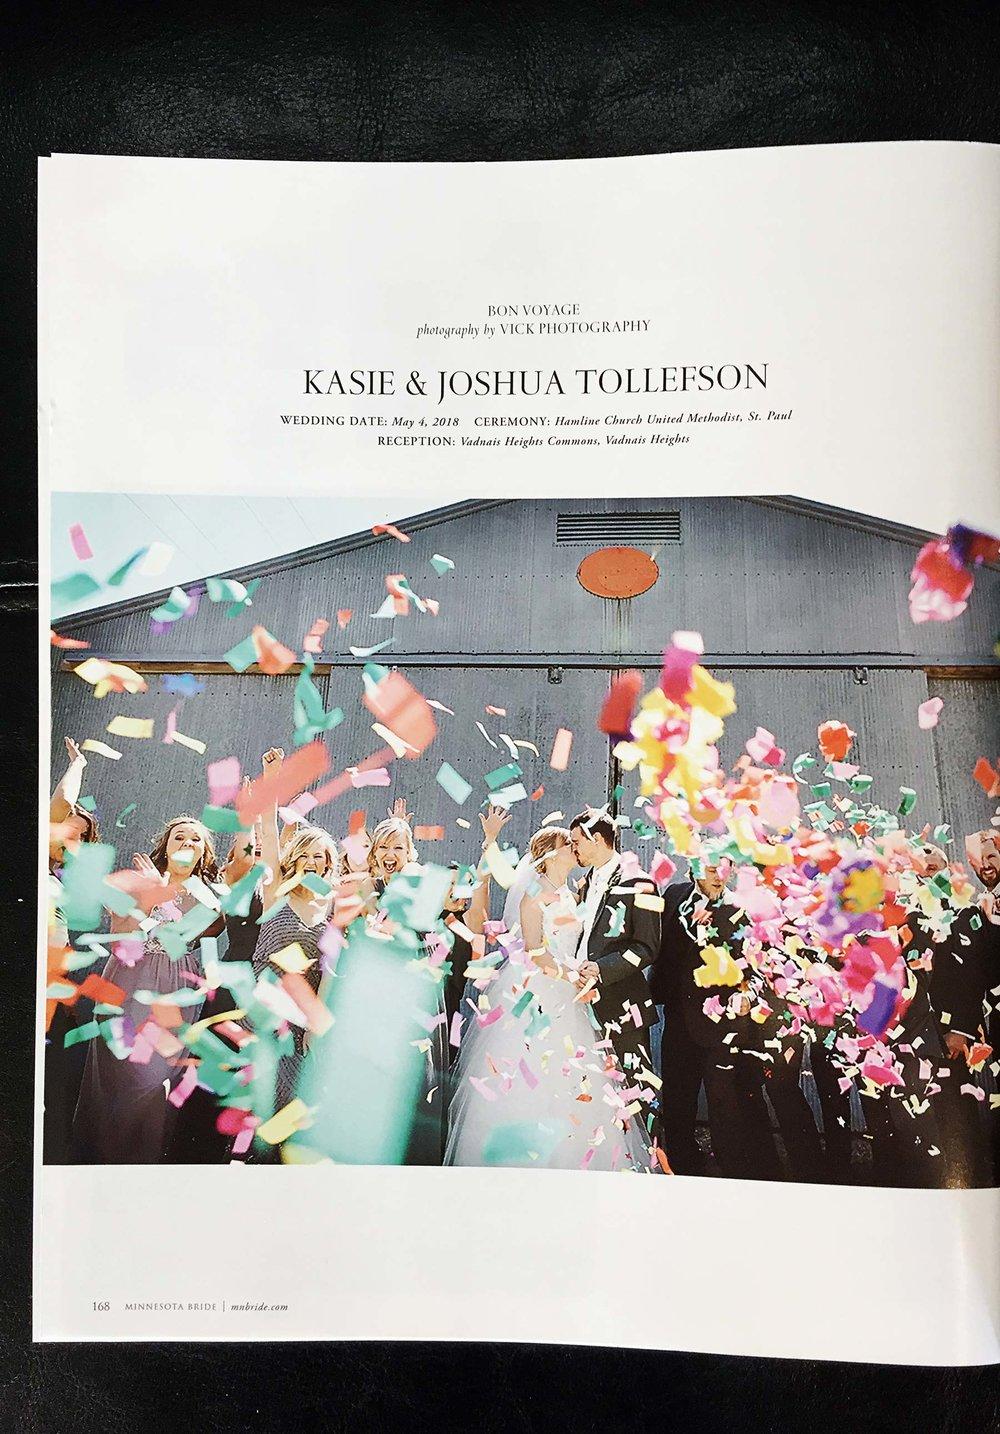 02-Minnesota-Bride-Magazine-Spring-2019-Cover-Vick-Photography-Bon-Voyage-Feature-Confetti.jpg